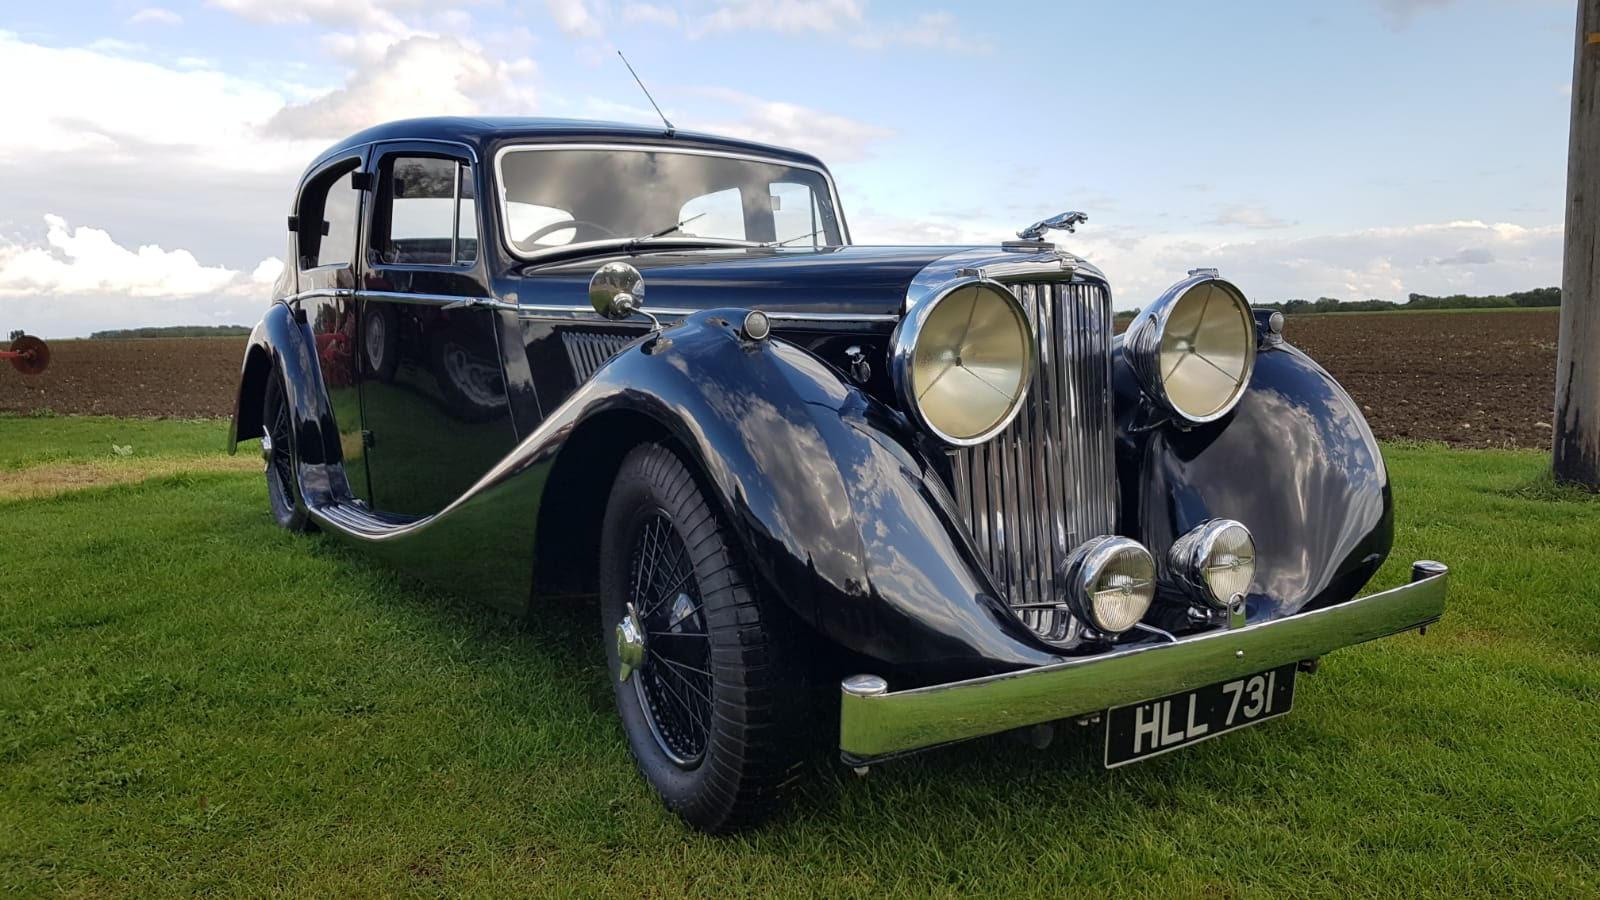 FOR SALE – 1946 Jaguar MK4 2.5 Litre